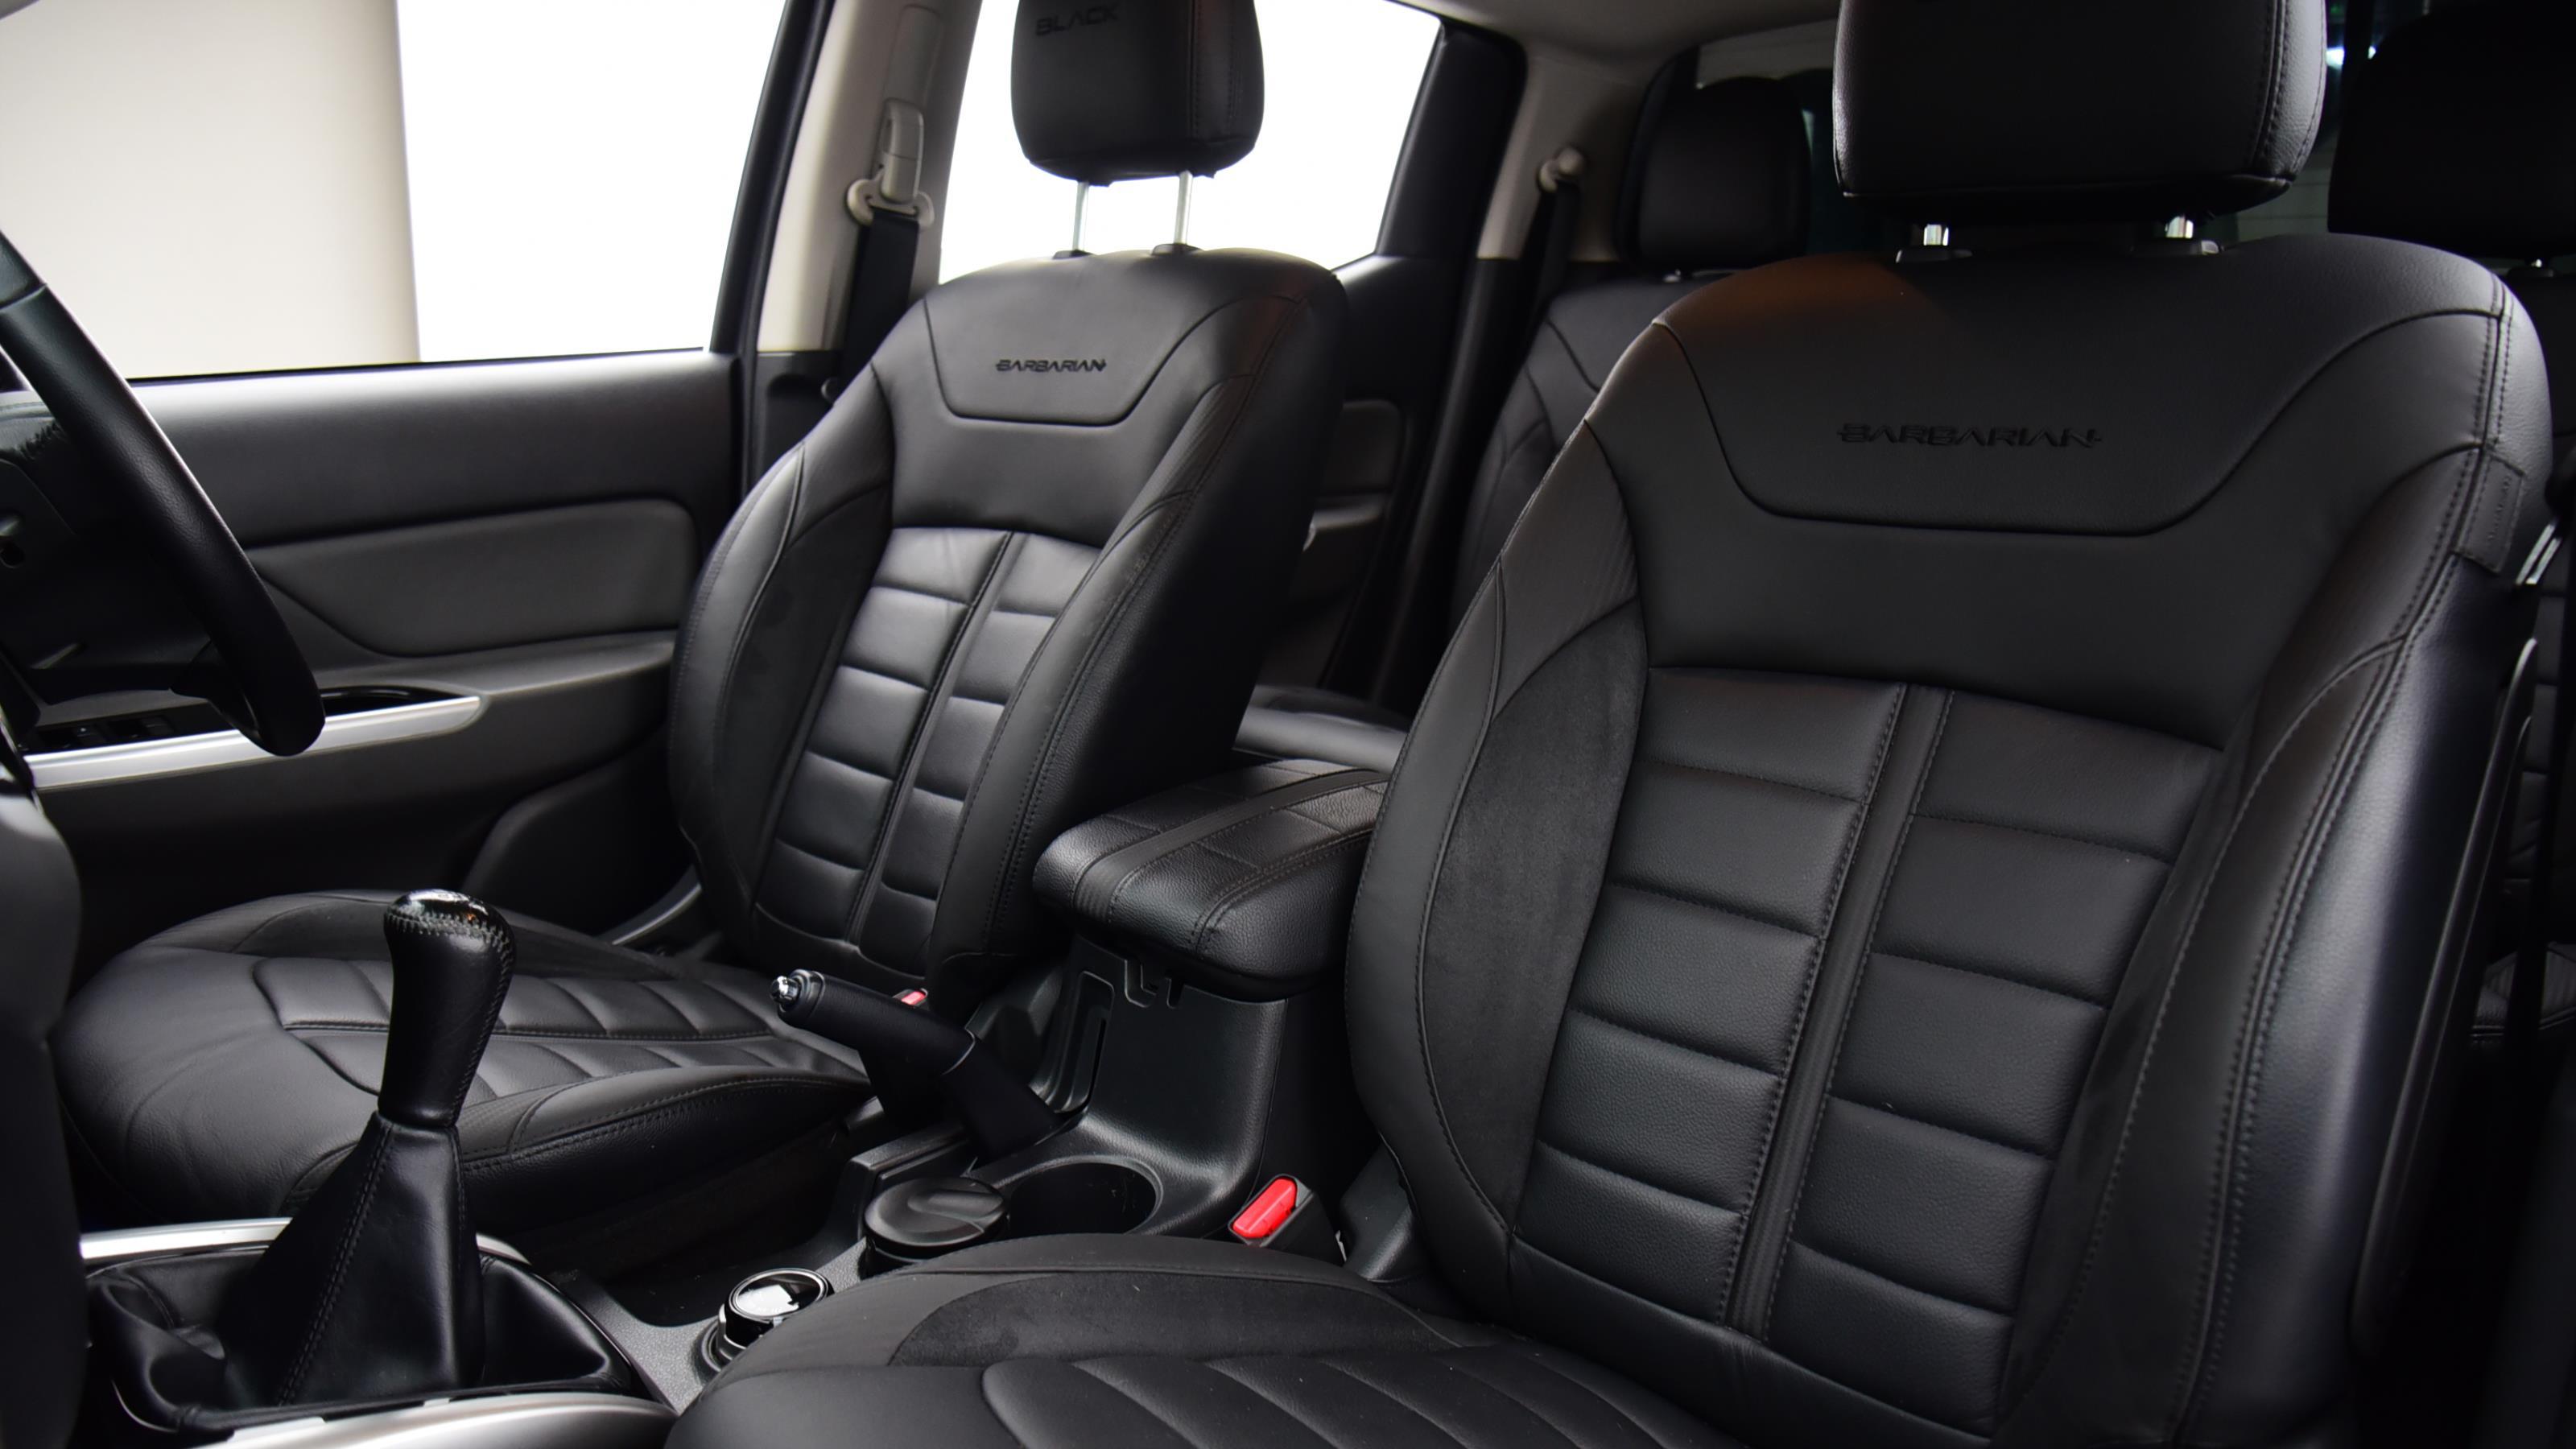 Used 2019 MITSUBISHI L200  SPECIAL EDITIONS Double Cab DI-D 181 Barbarian Black 4WD GREY at Saxton4x4